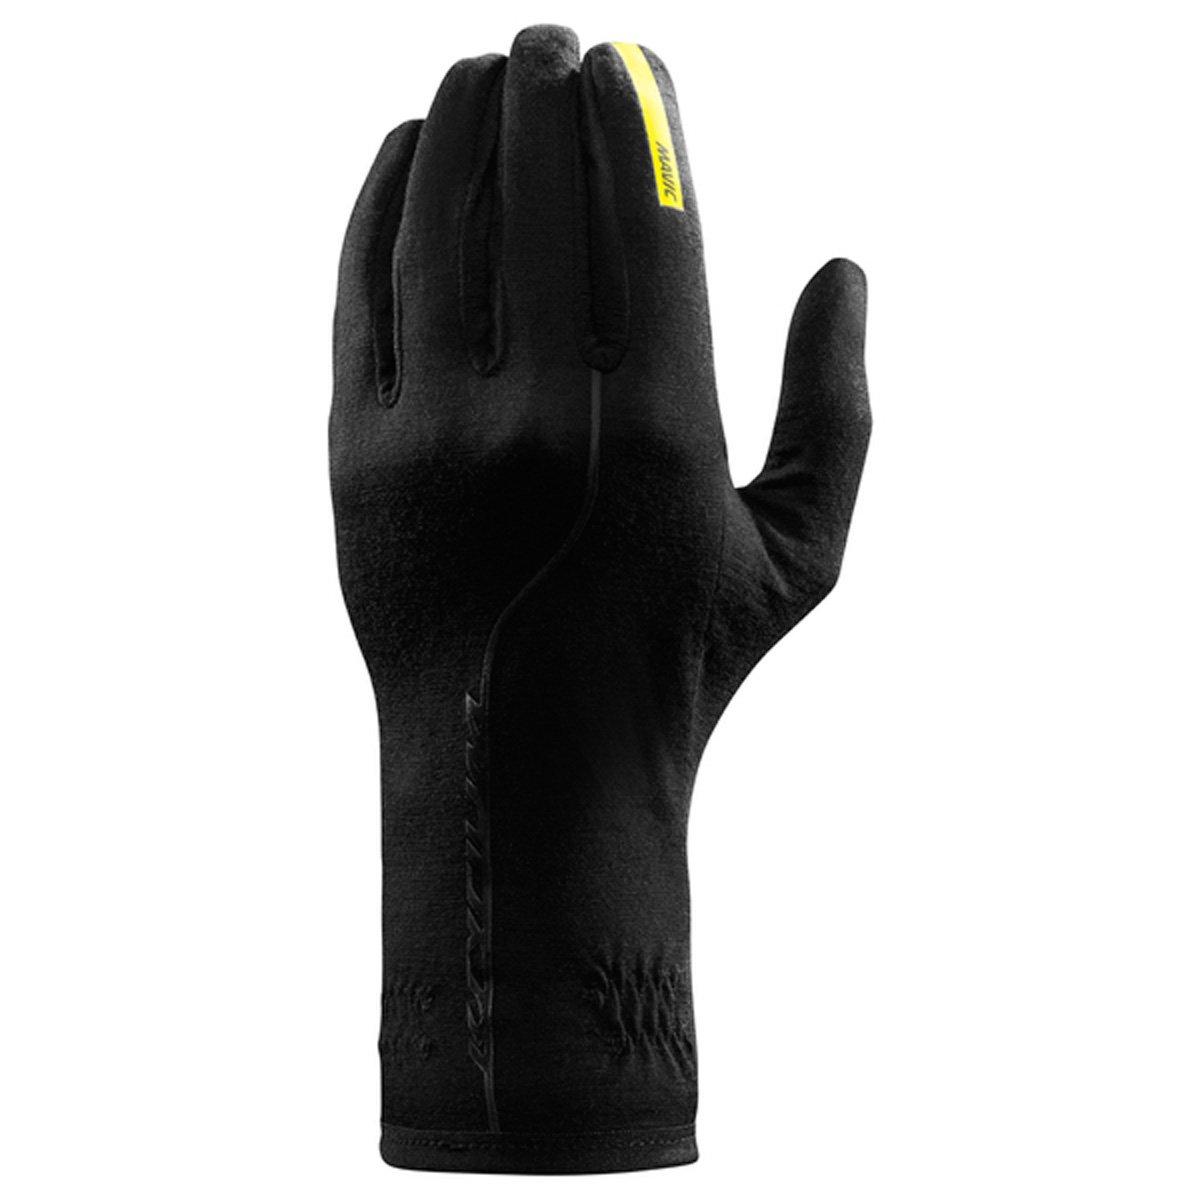 Mavic Ksyrium Merino Glove 3L ブラック B01DYETW1G